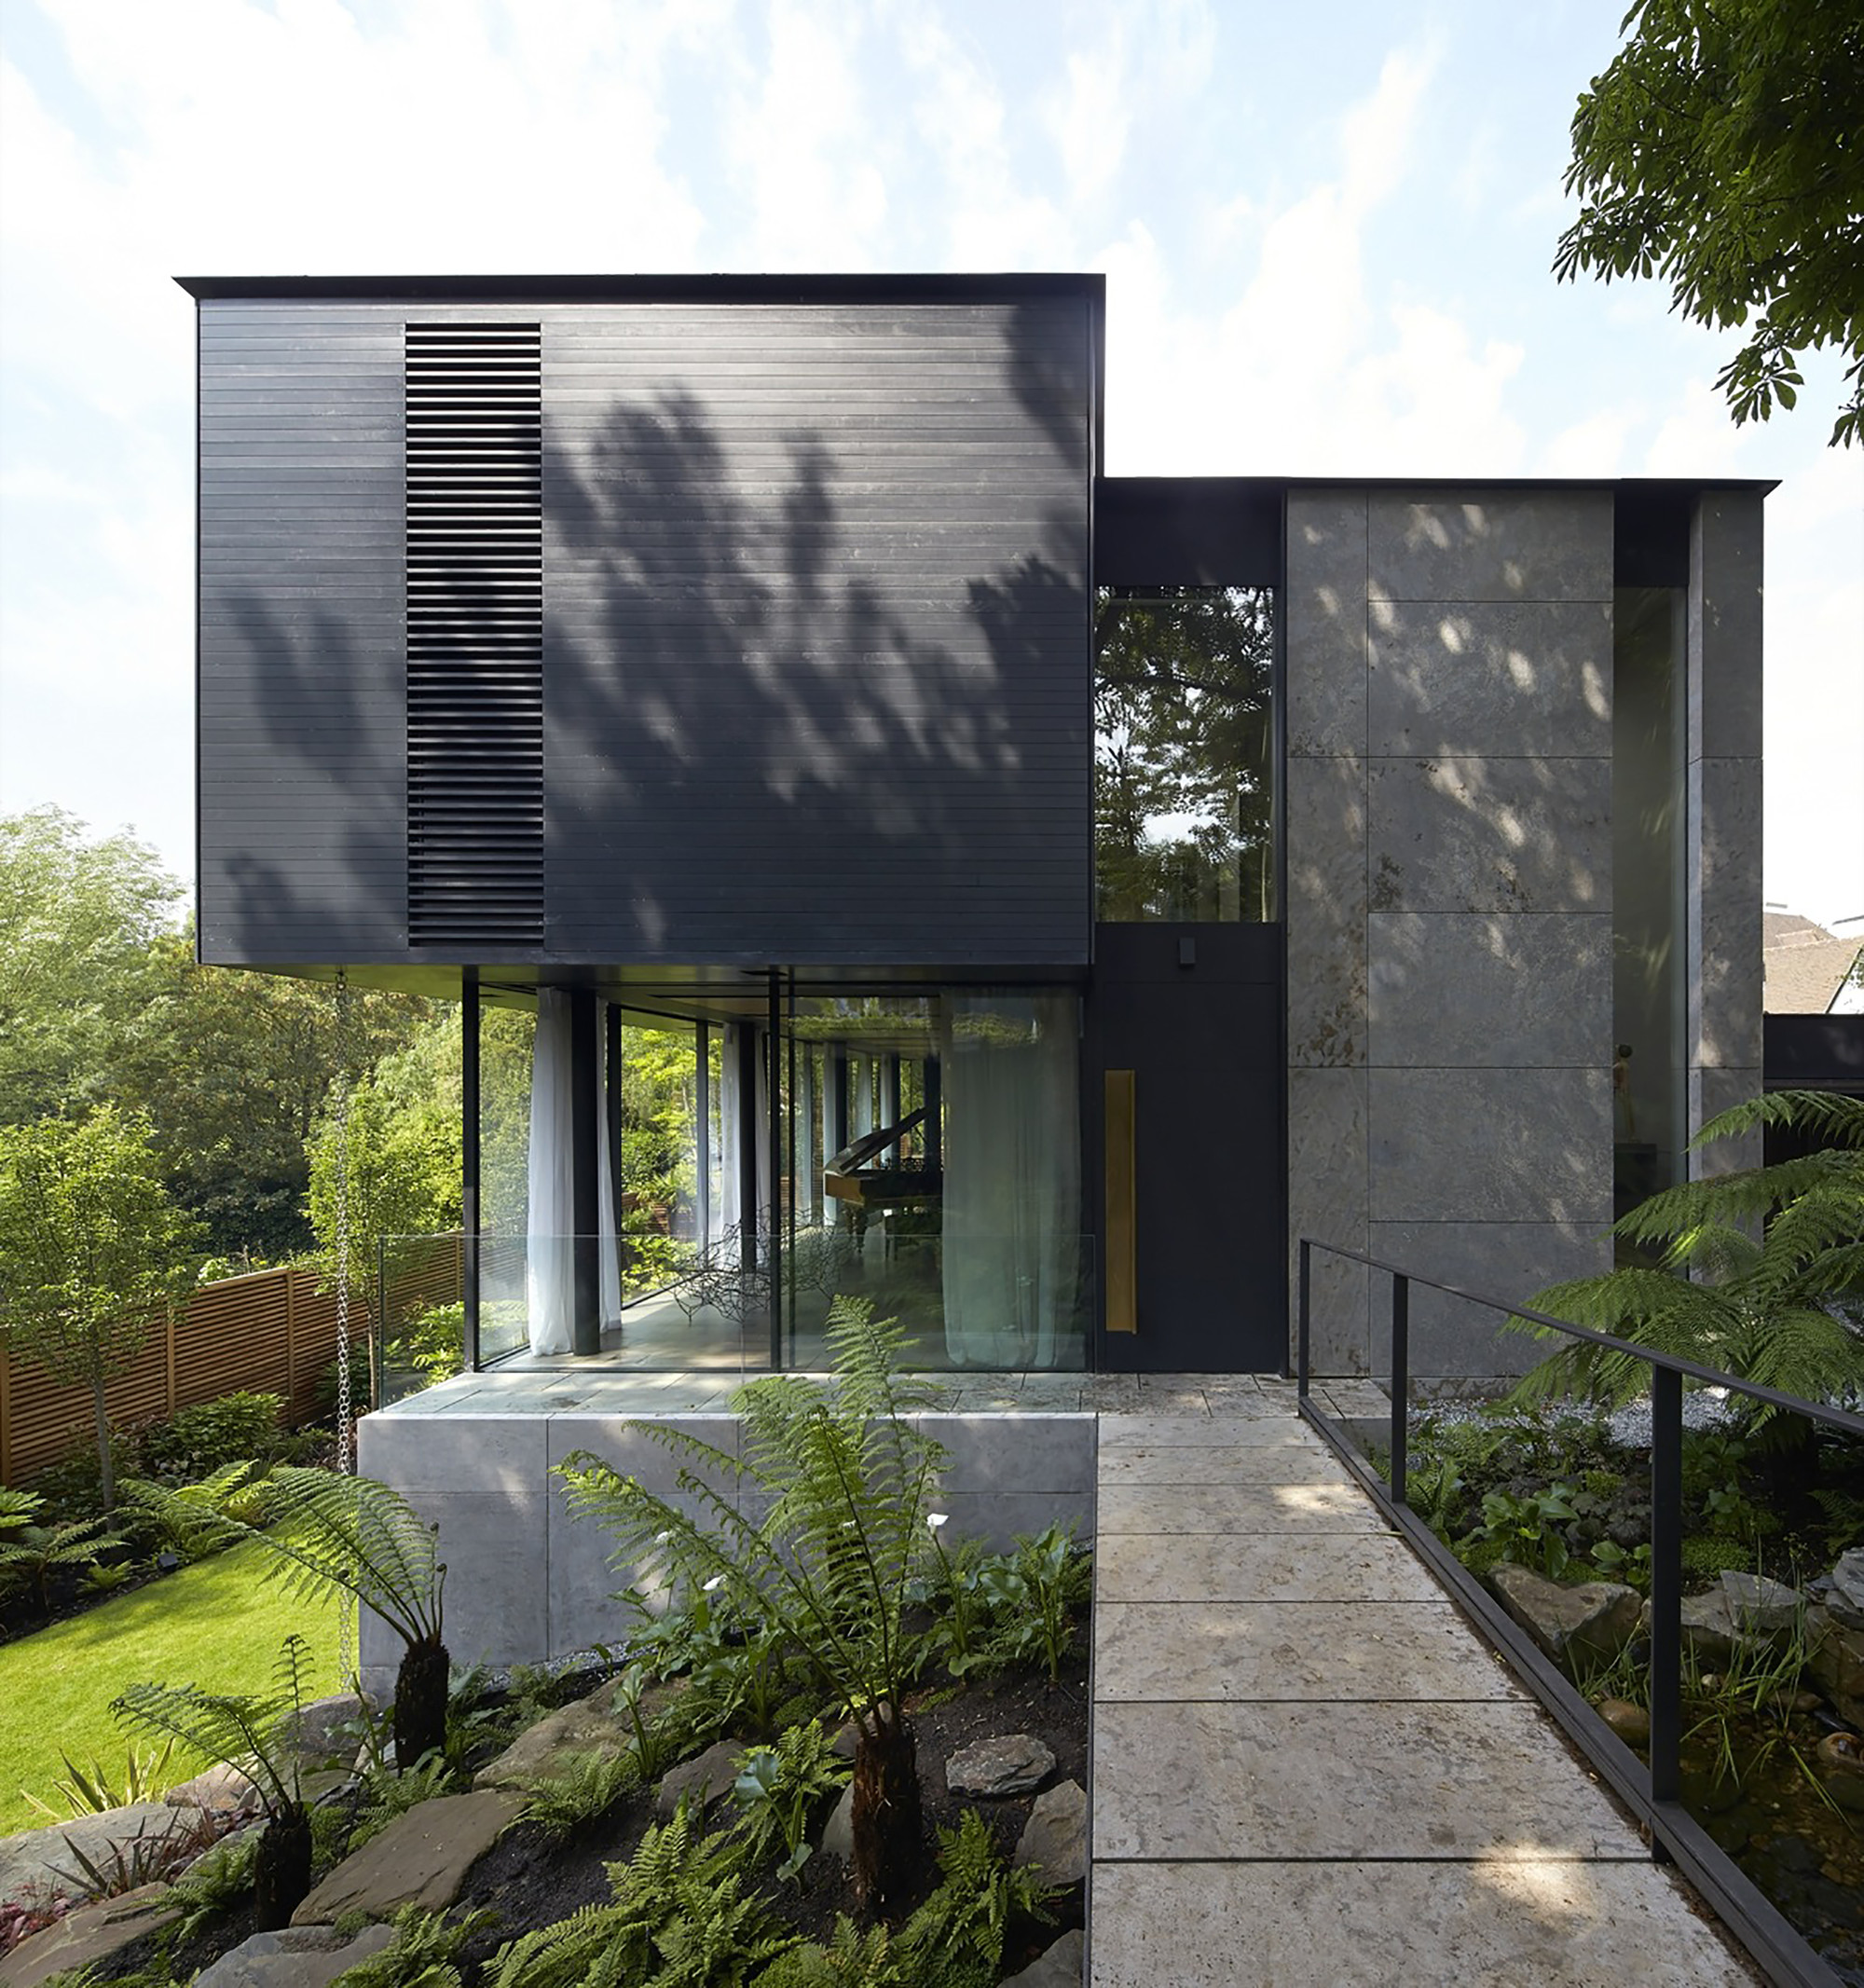 Fitzroy Park House / Stanton Williams, © Hufton+Crow